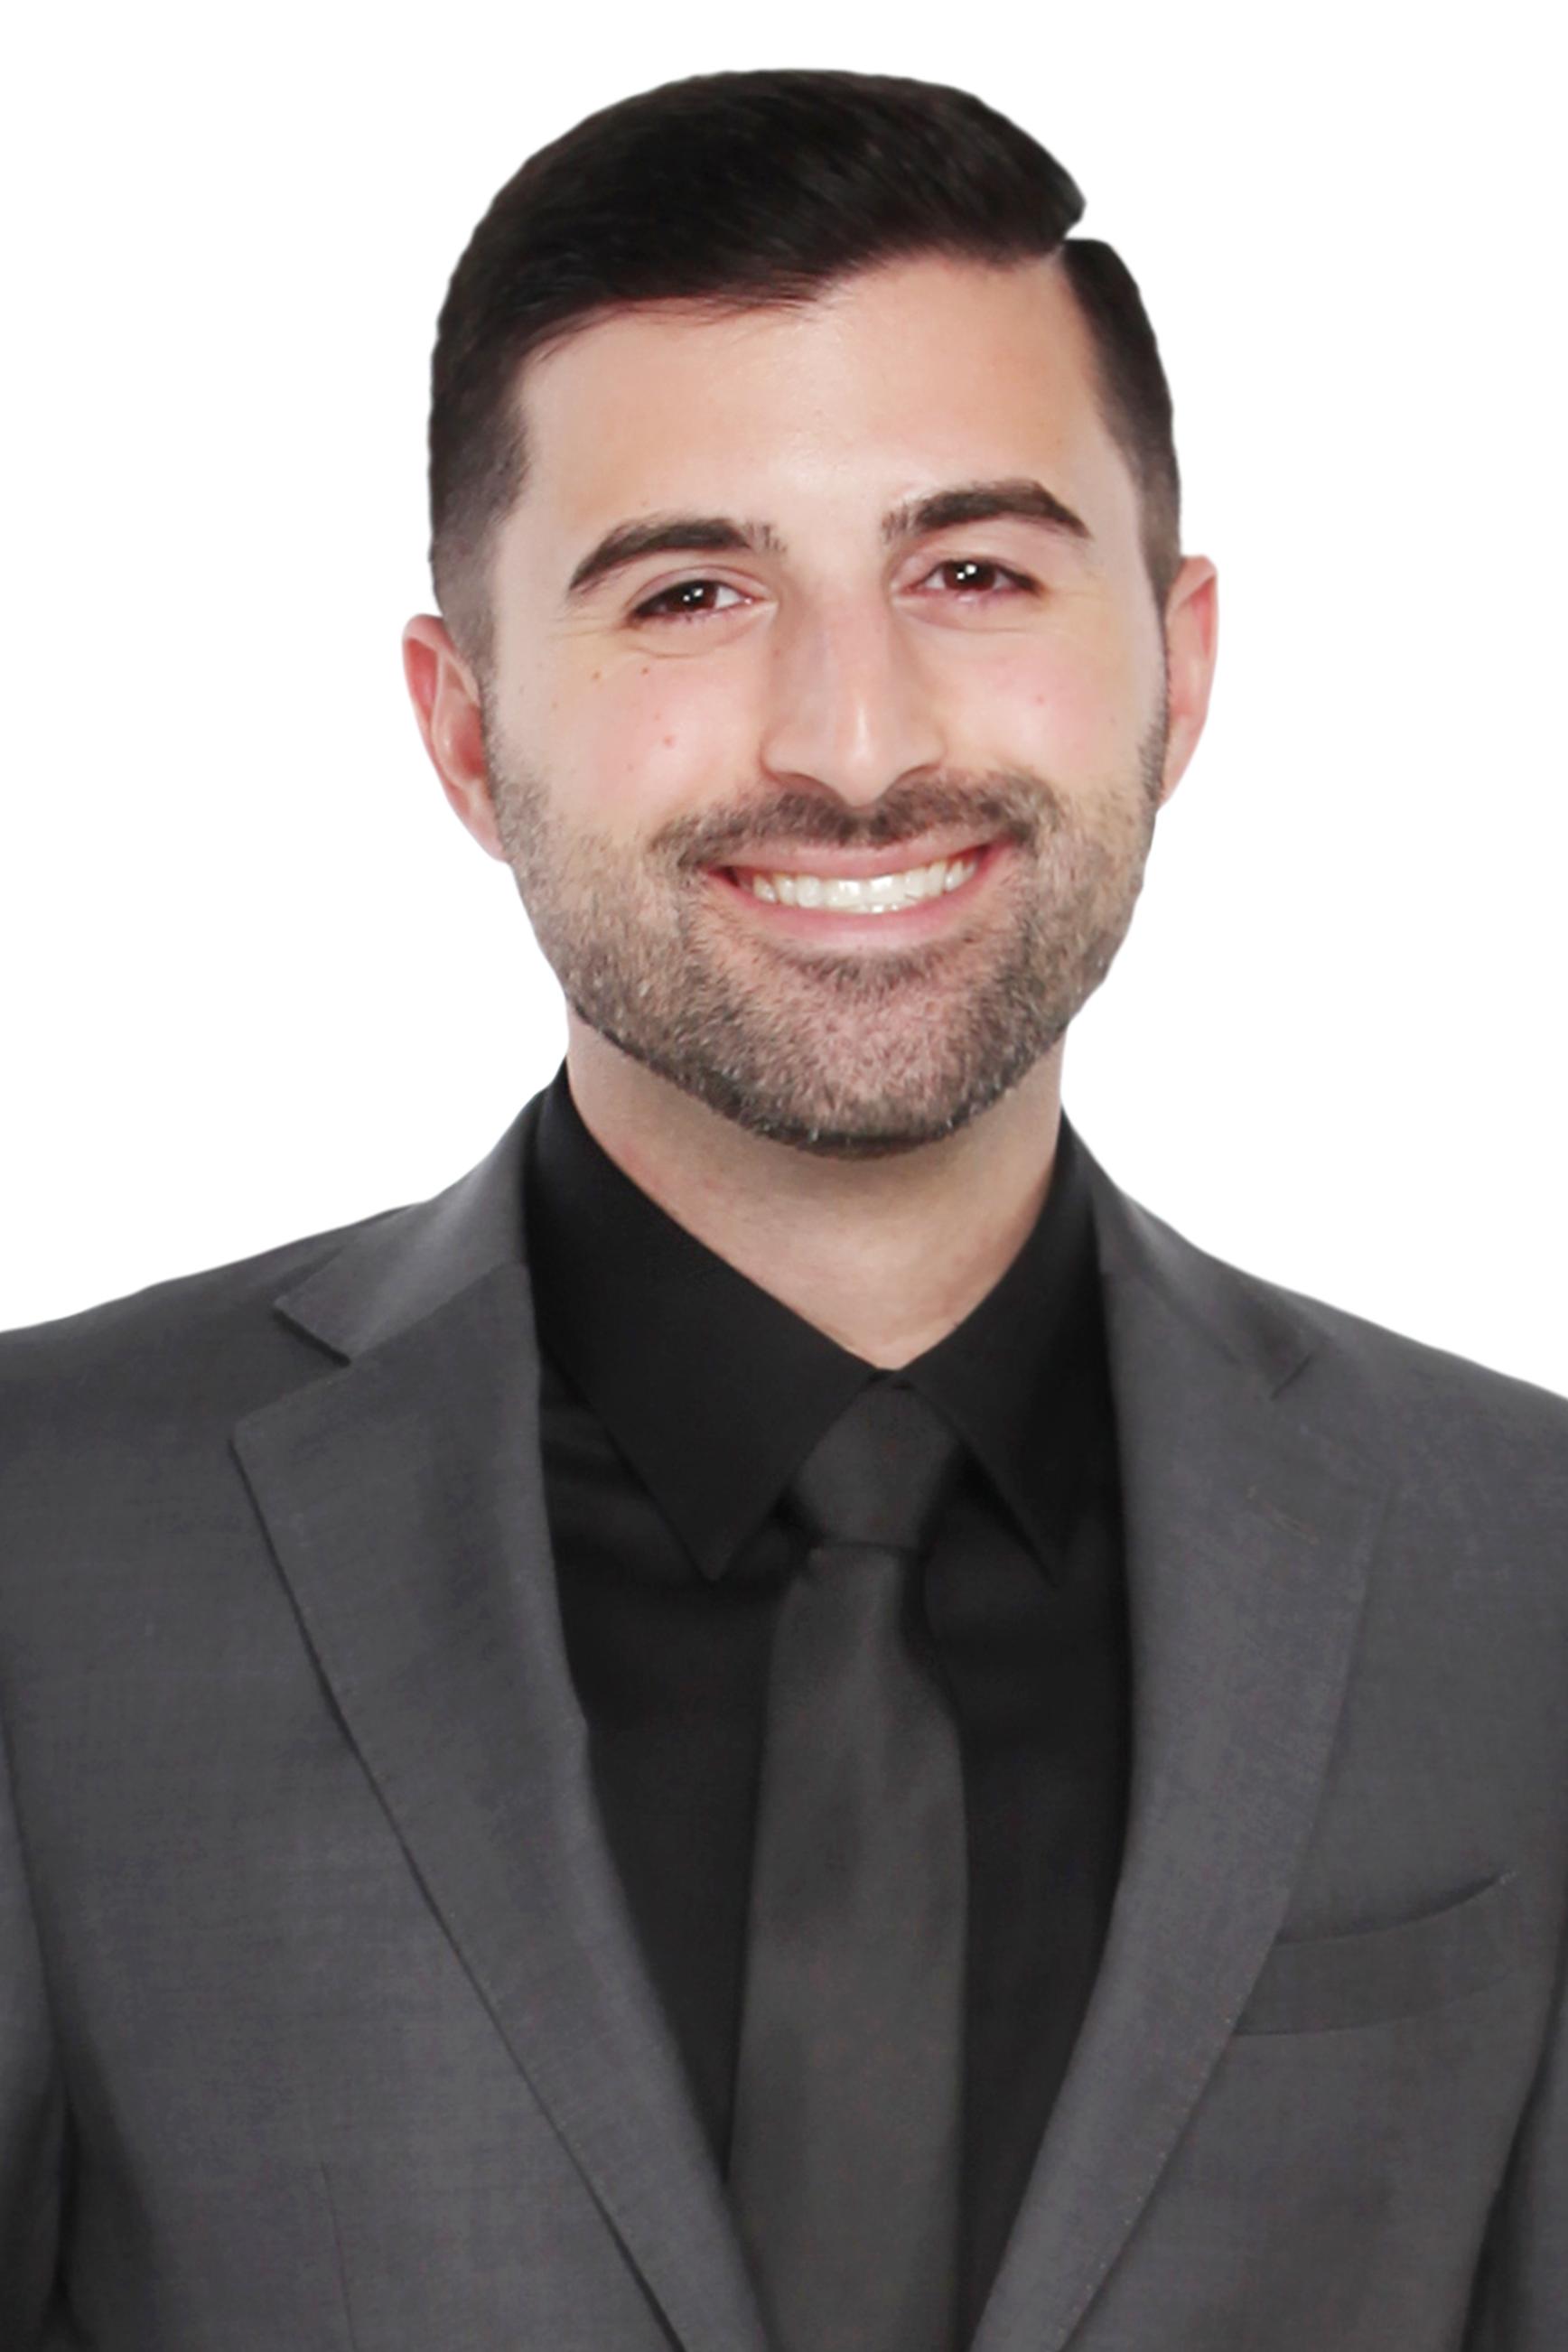 Ken Oral, Real Estate Agent - Yorba Linda, CA - Coldwell